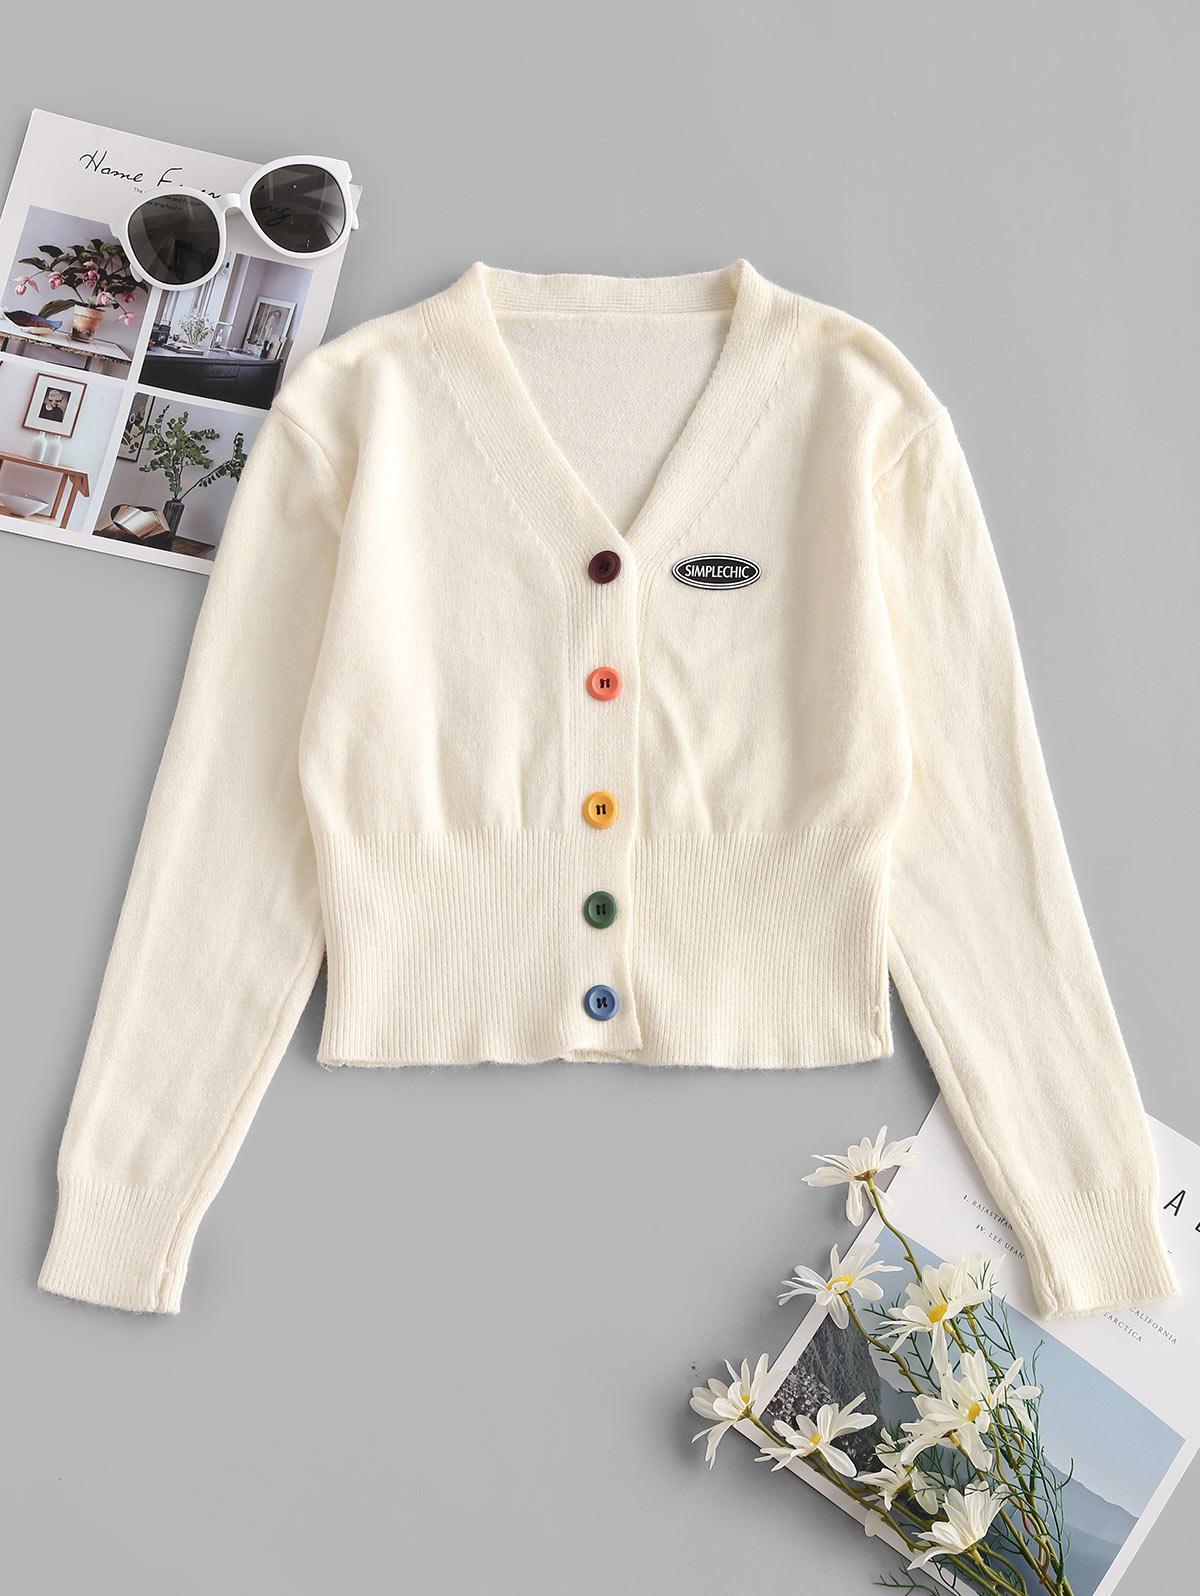 Colorful Button Applique V Neck Cardigan